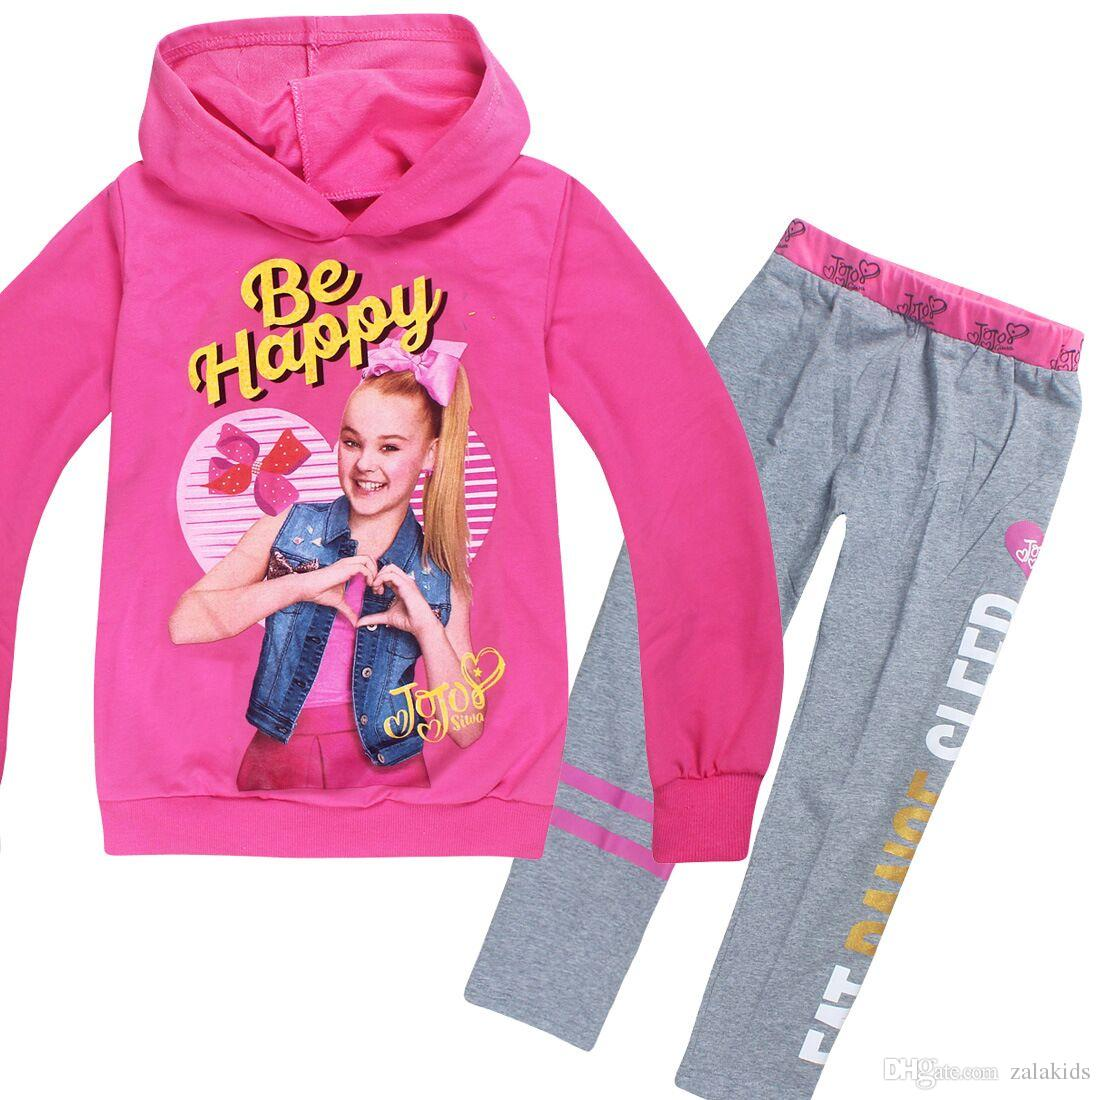 6311620d3 6 Colors Girls JOJO Siwa Clothing Sets Autumn Children Hoodies Sweatshirts  + Long Pants 2pcs Outfits JOJO Printed Kids Casual Sets 4-10Y